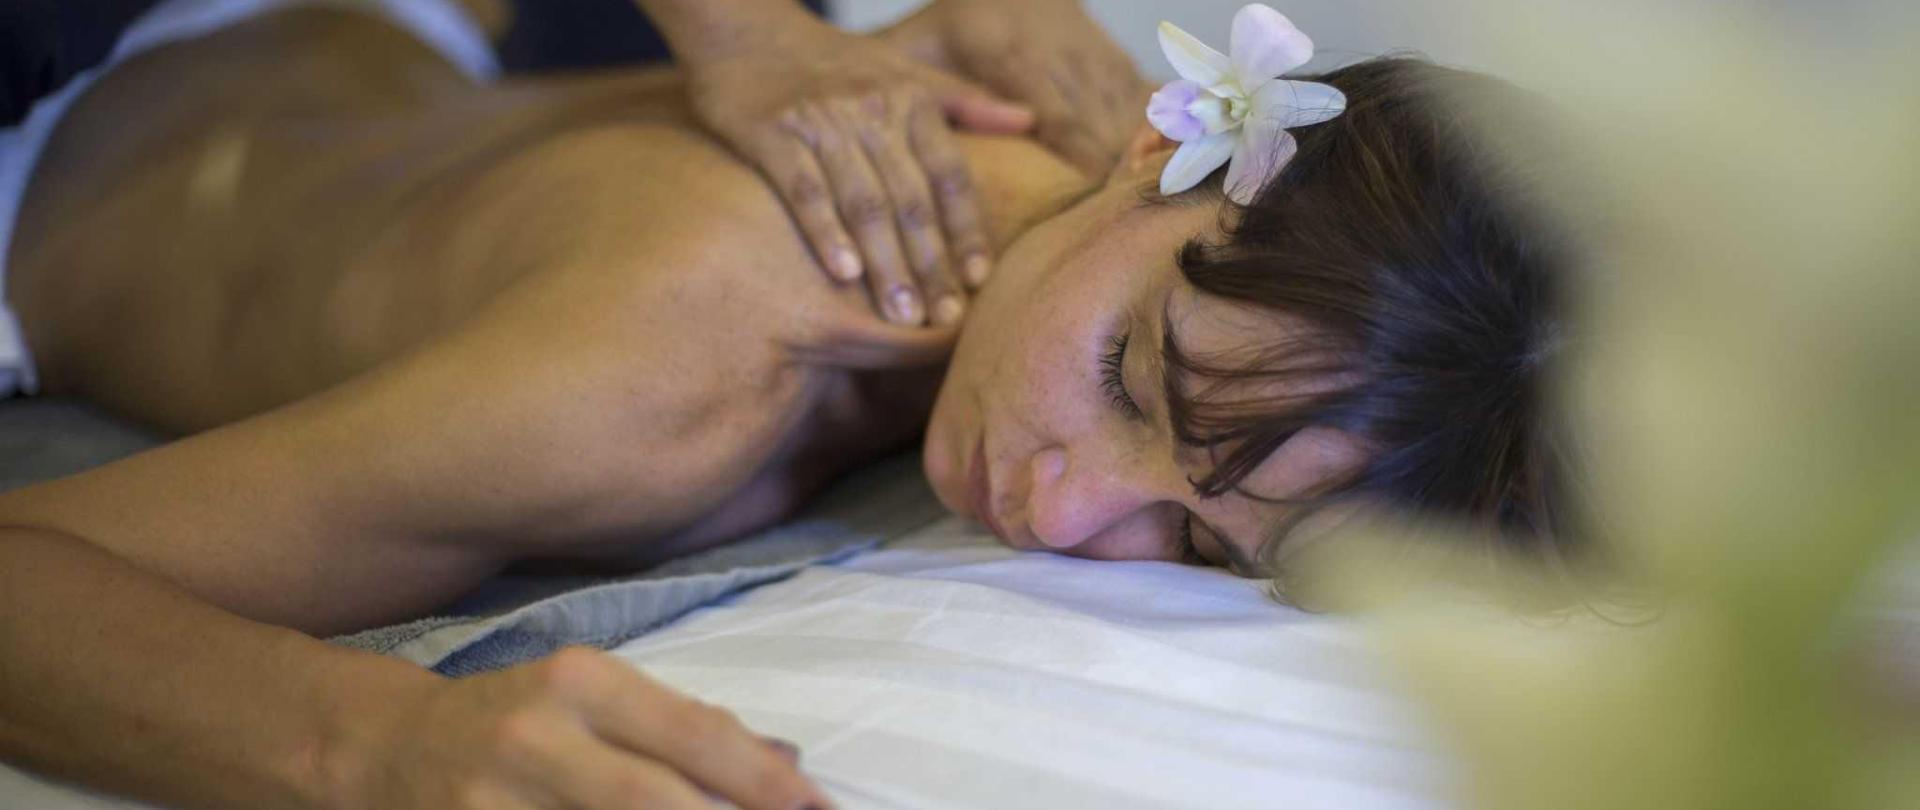 massage-service.JPG